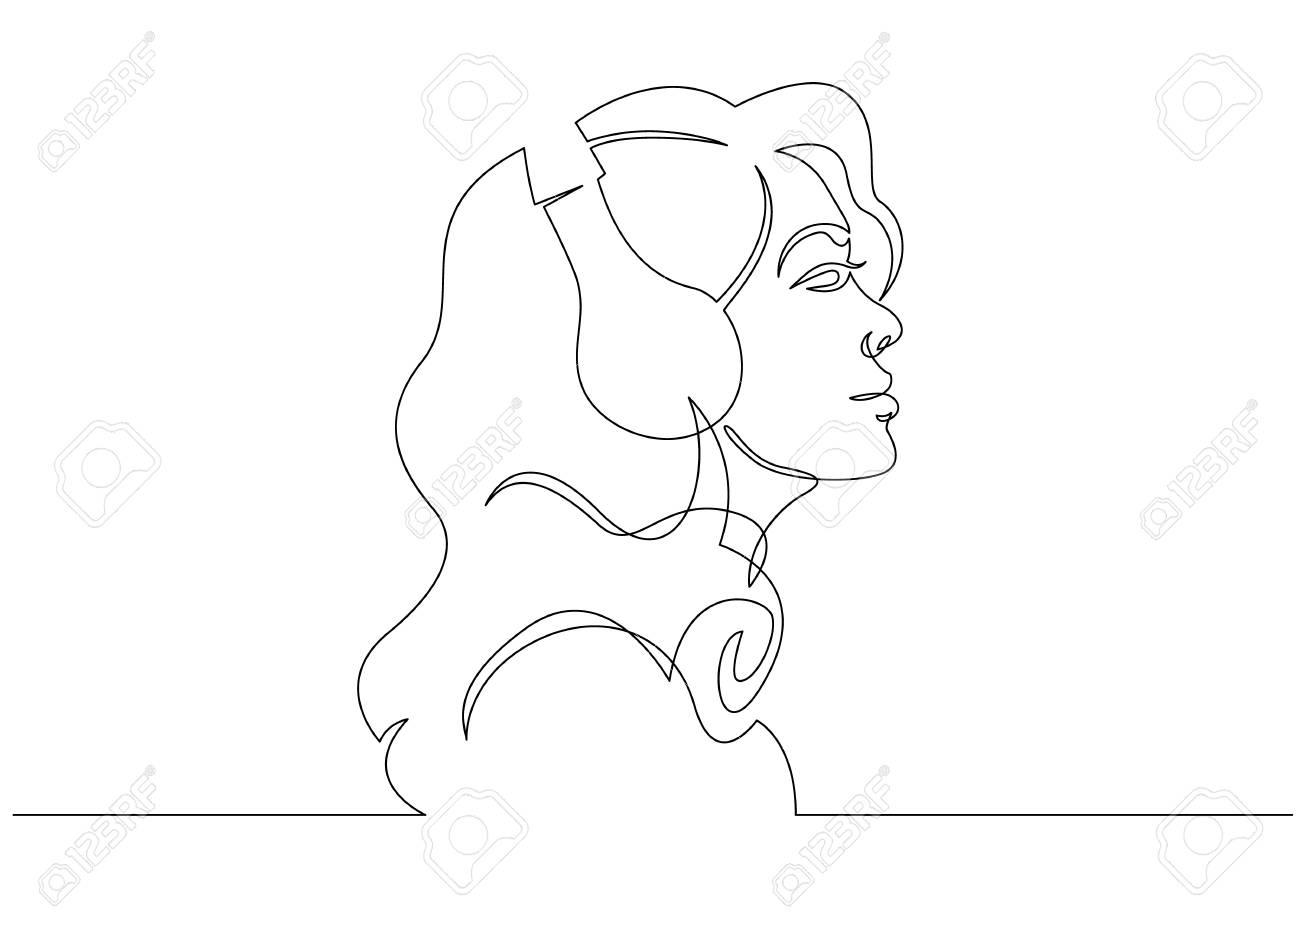 Line Art Abstract Woman